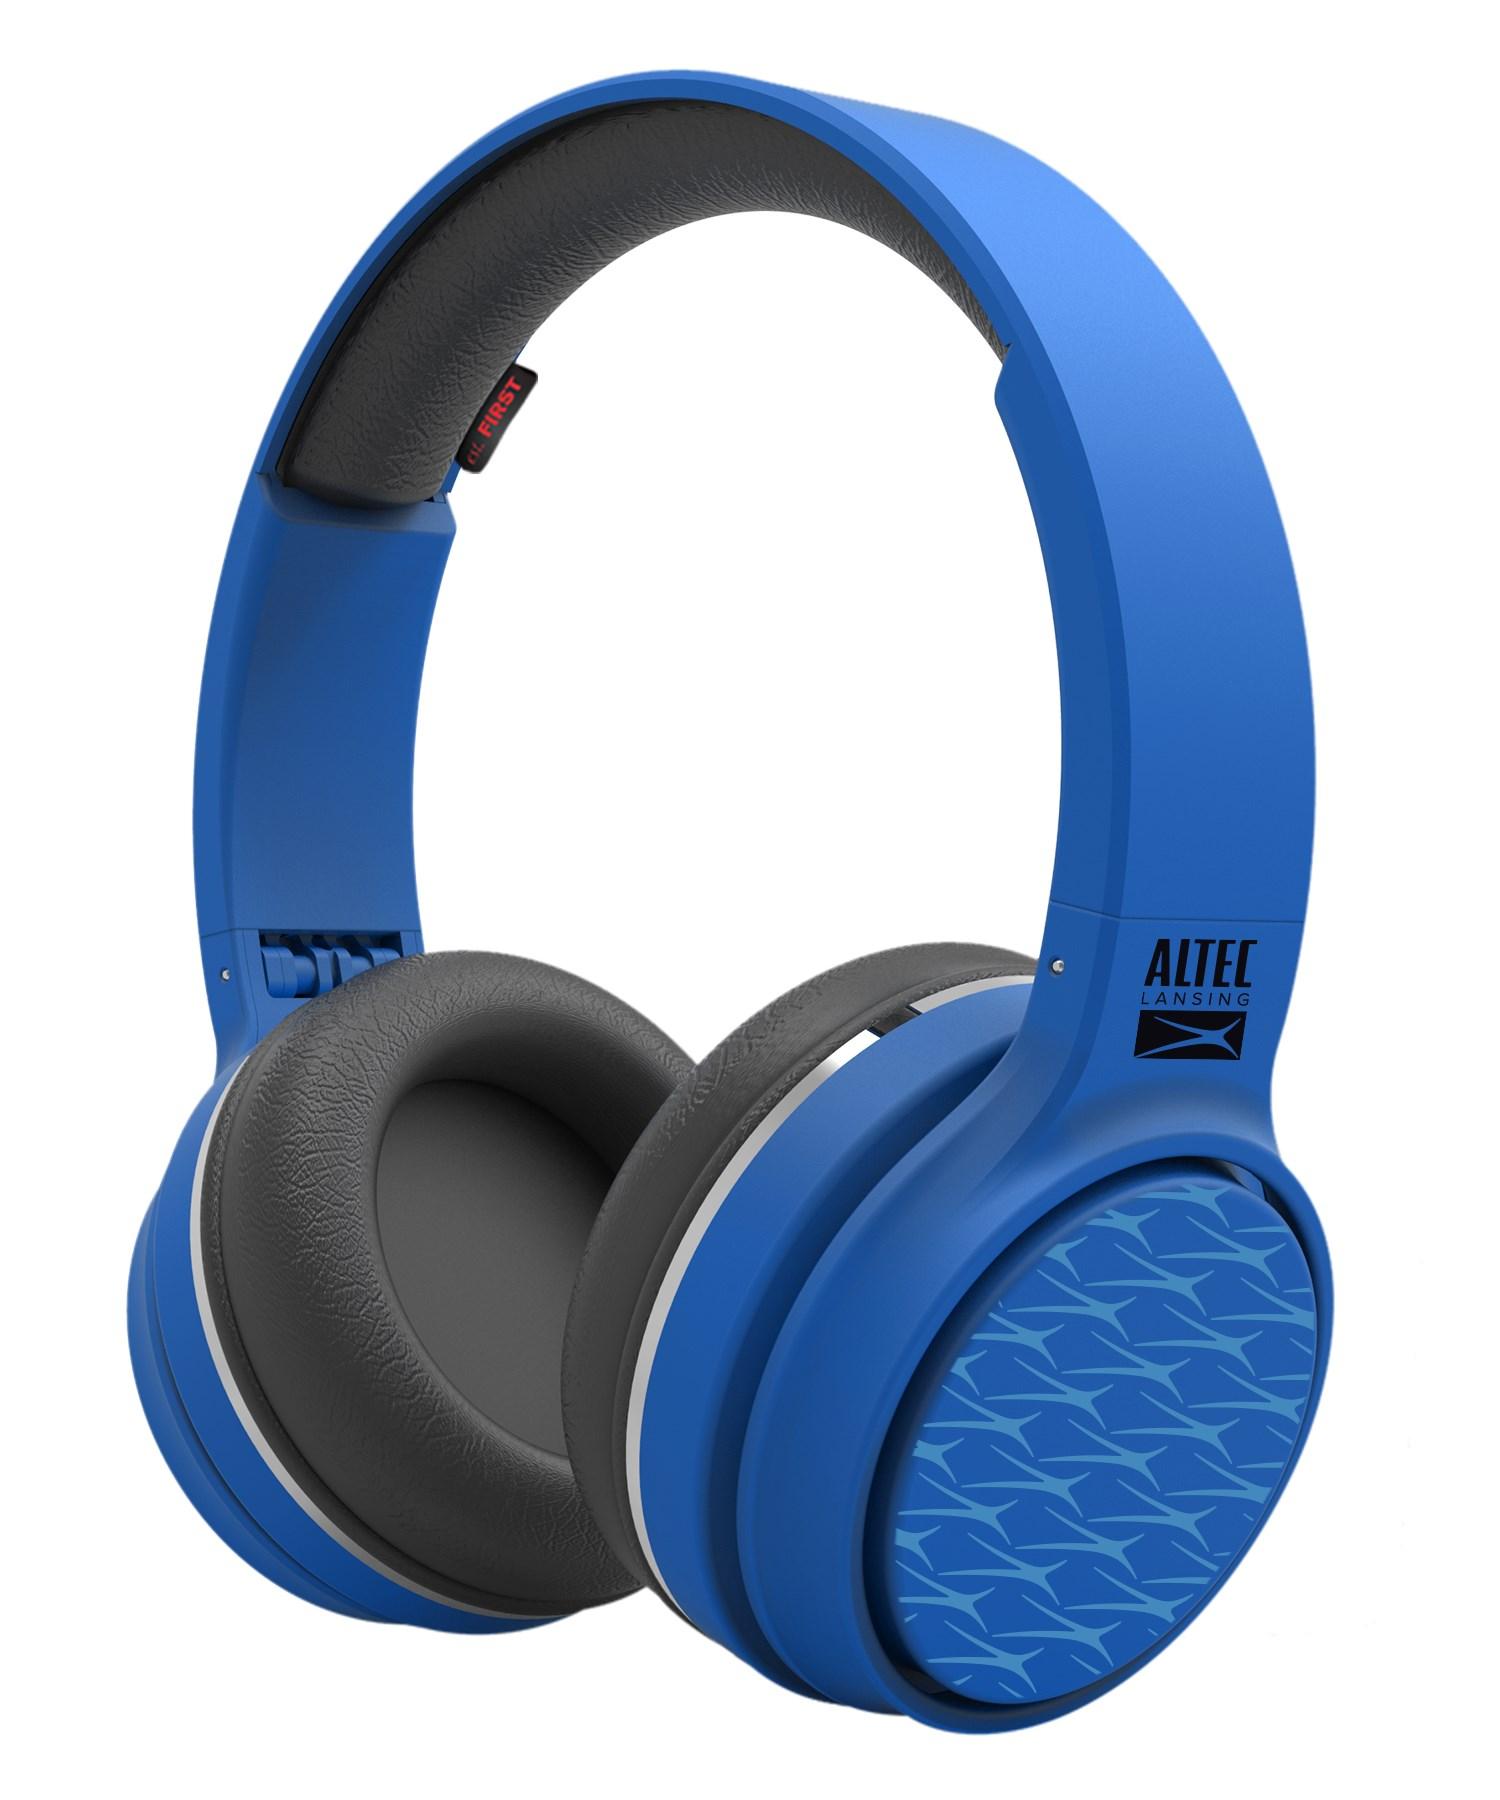 ALTEC LANSING bluetooth headphones Ring 'n' Go play & party, μπλε - ALTEC 21746